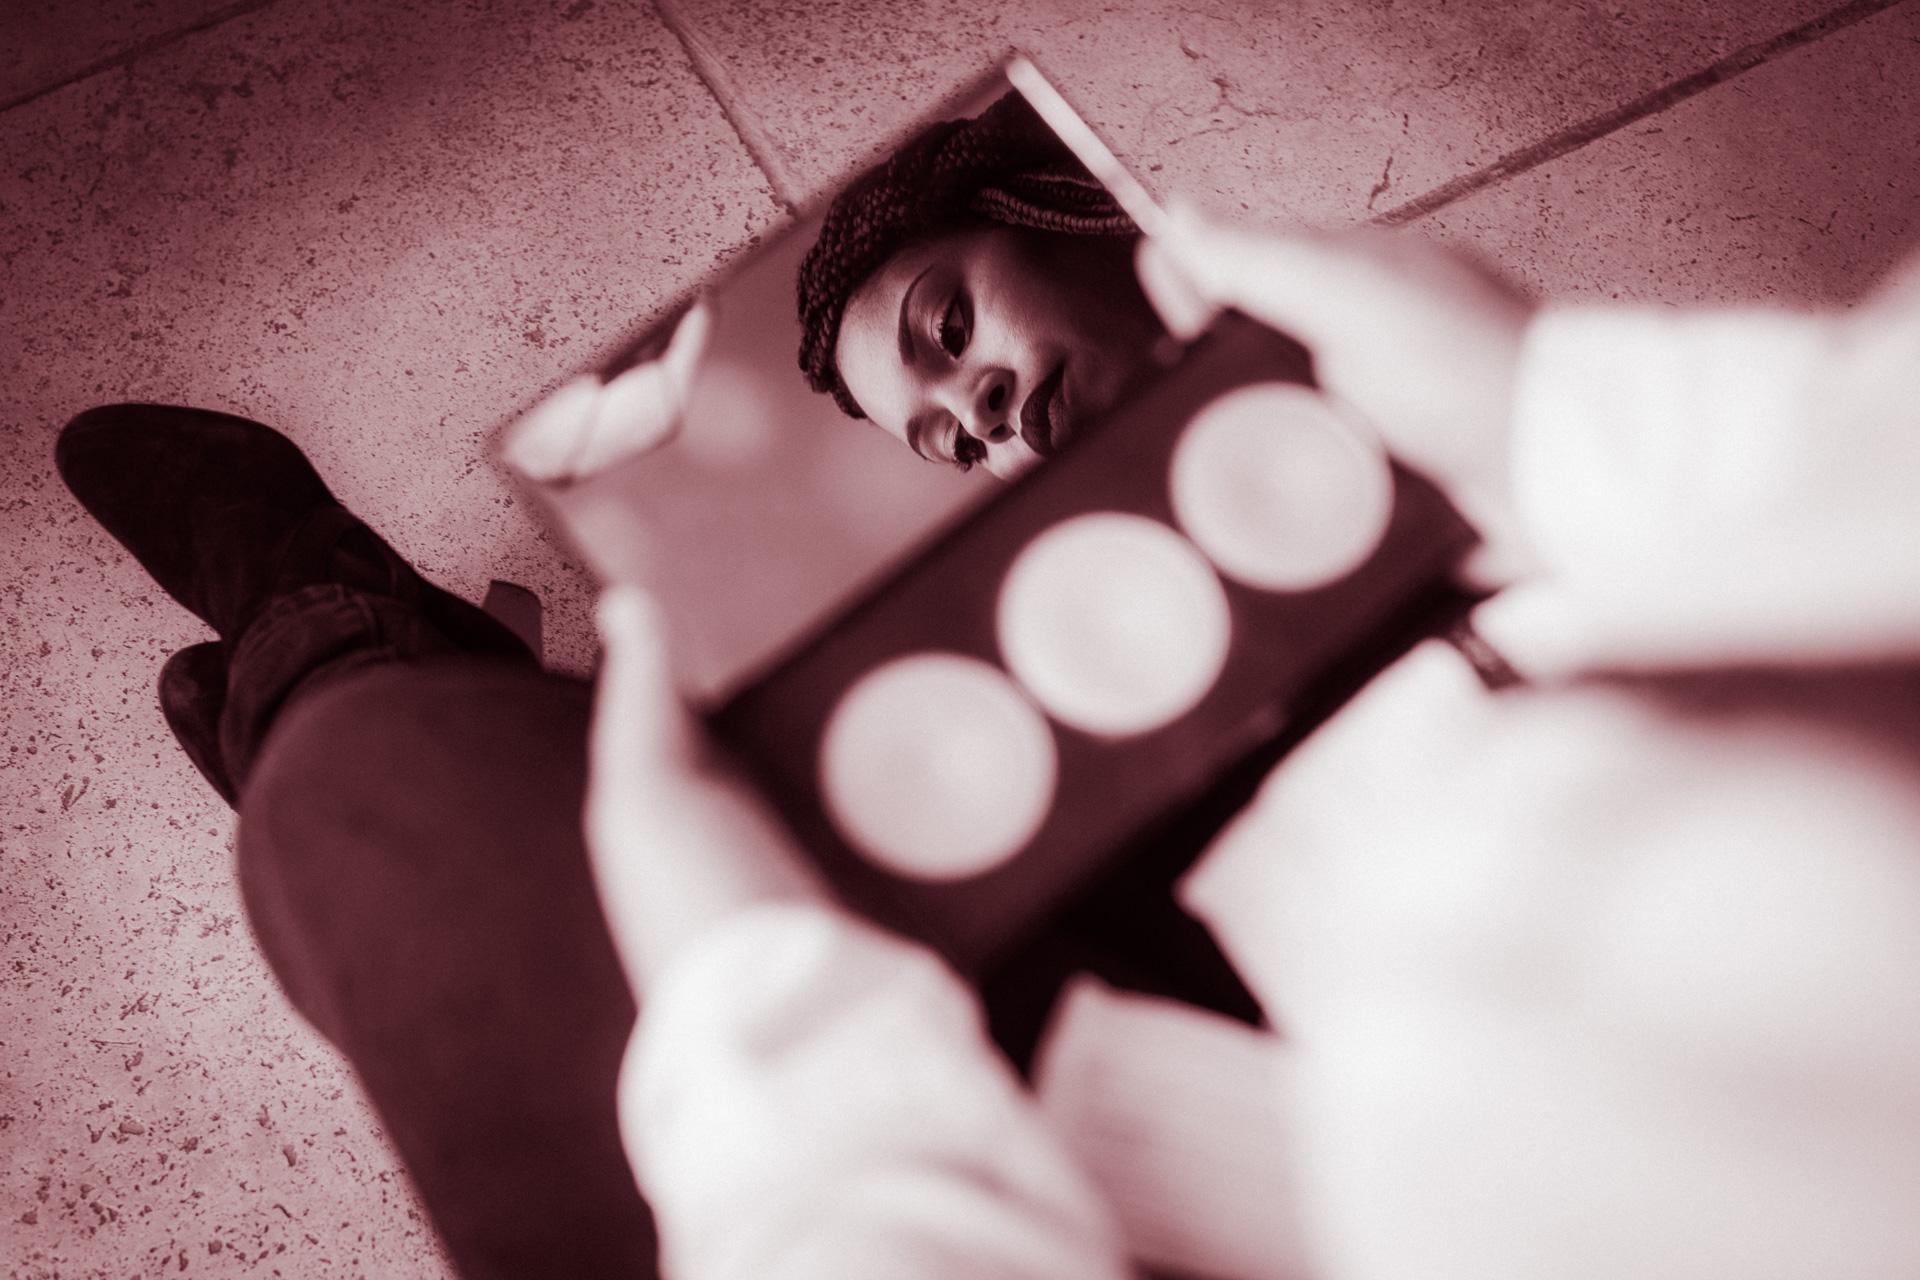 PhotographeRouen.fr-4-Maquillage by Ta Sha-1217155707-_10A4971-